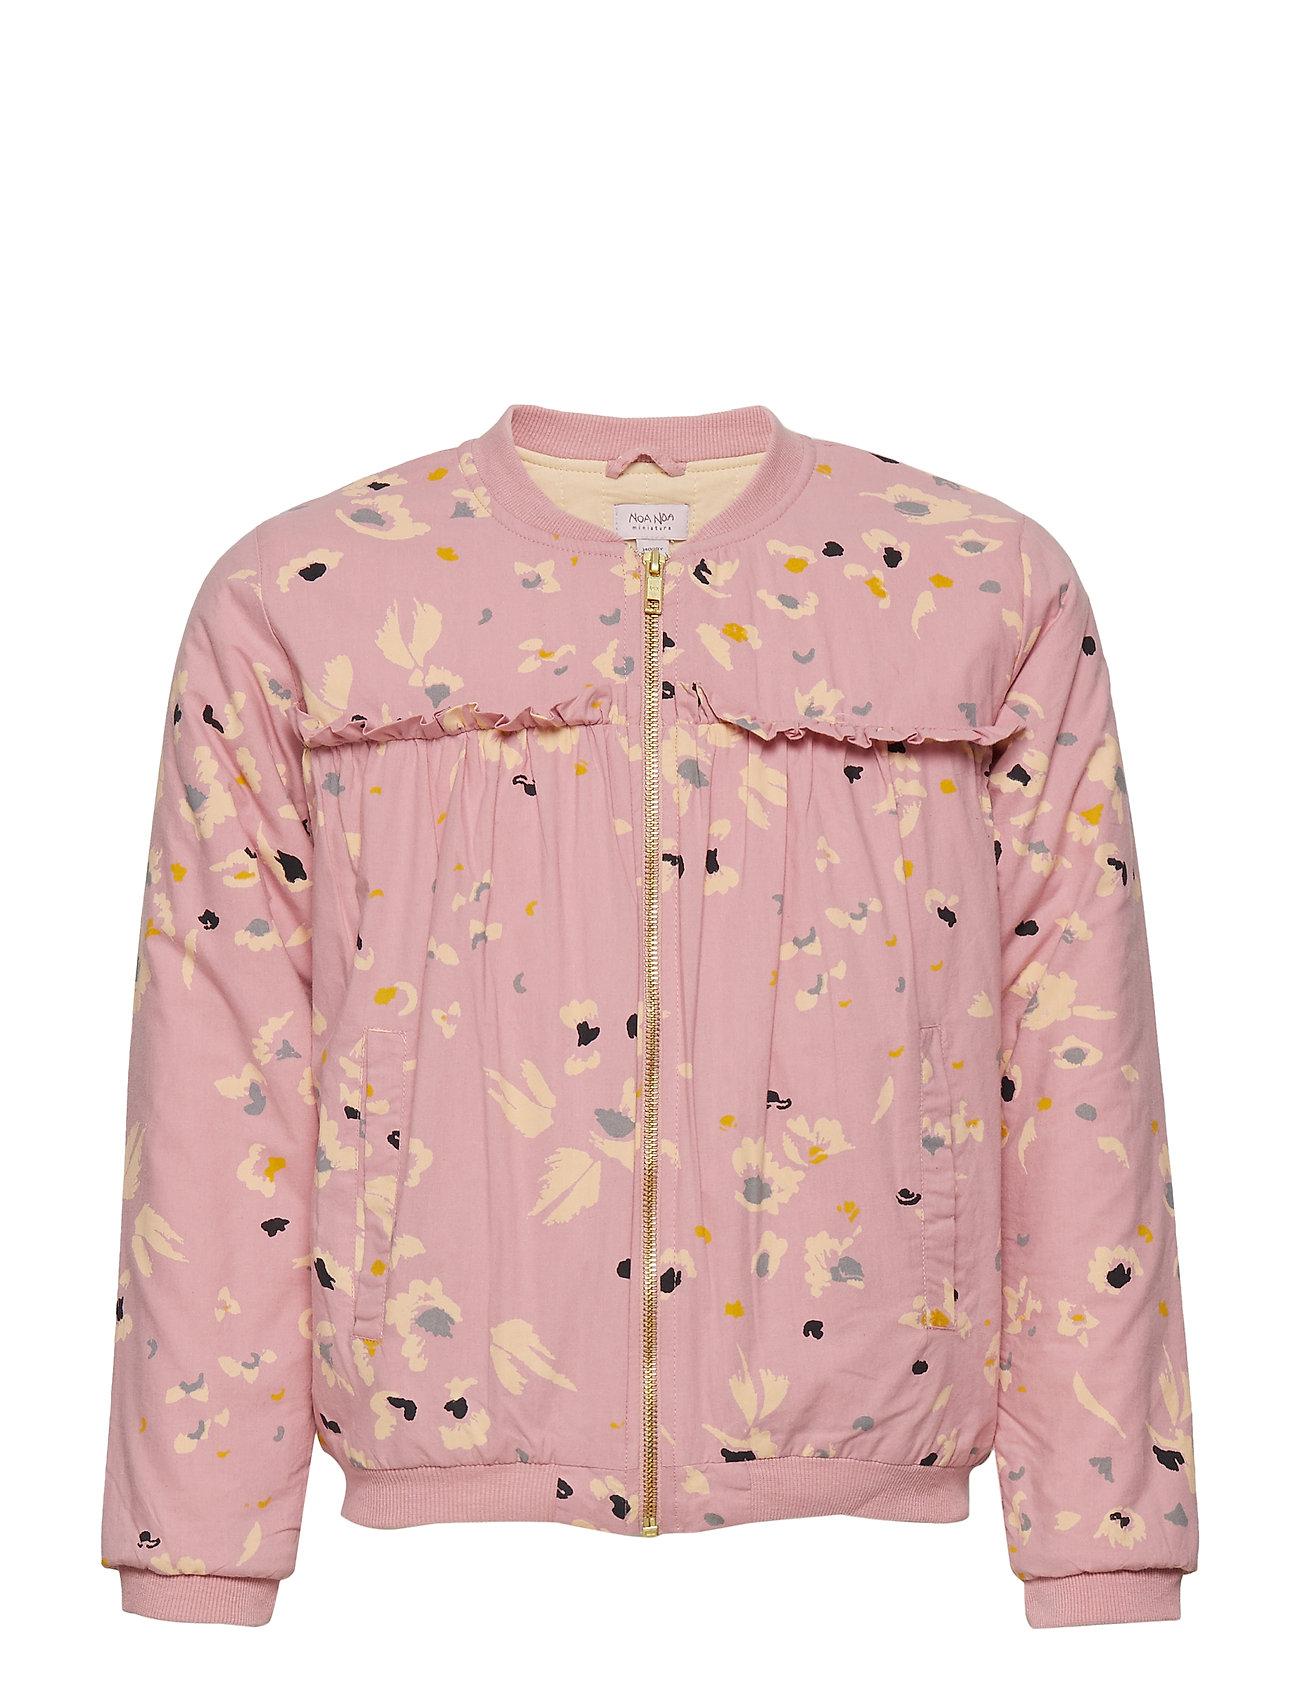 Noa Noa Miniature Jacket - ROSE TAN